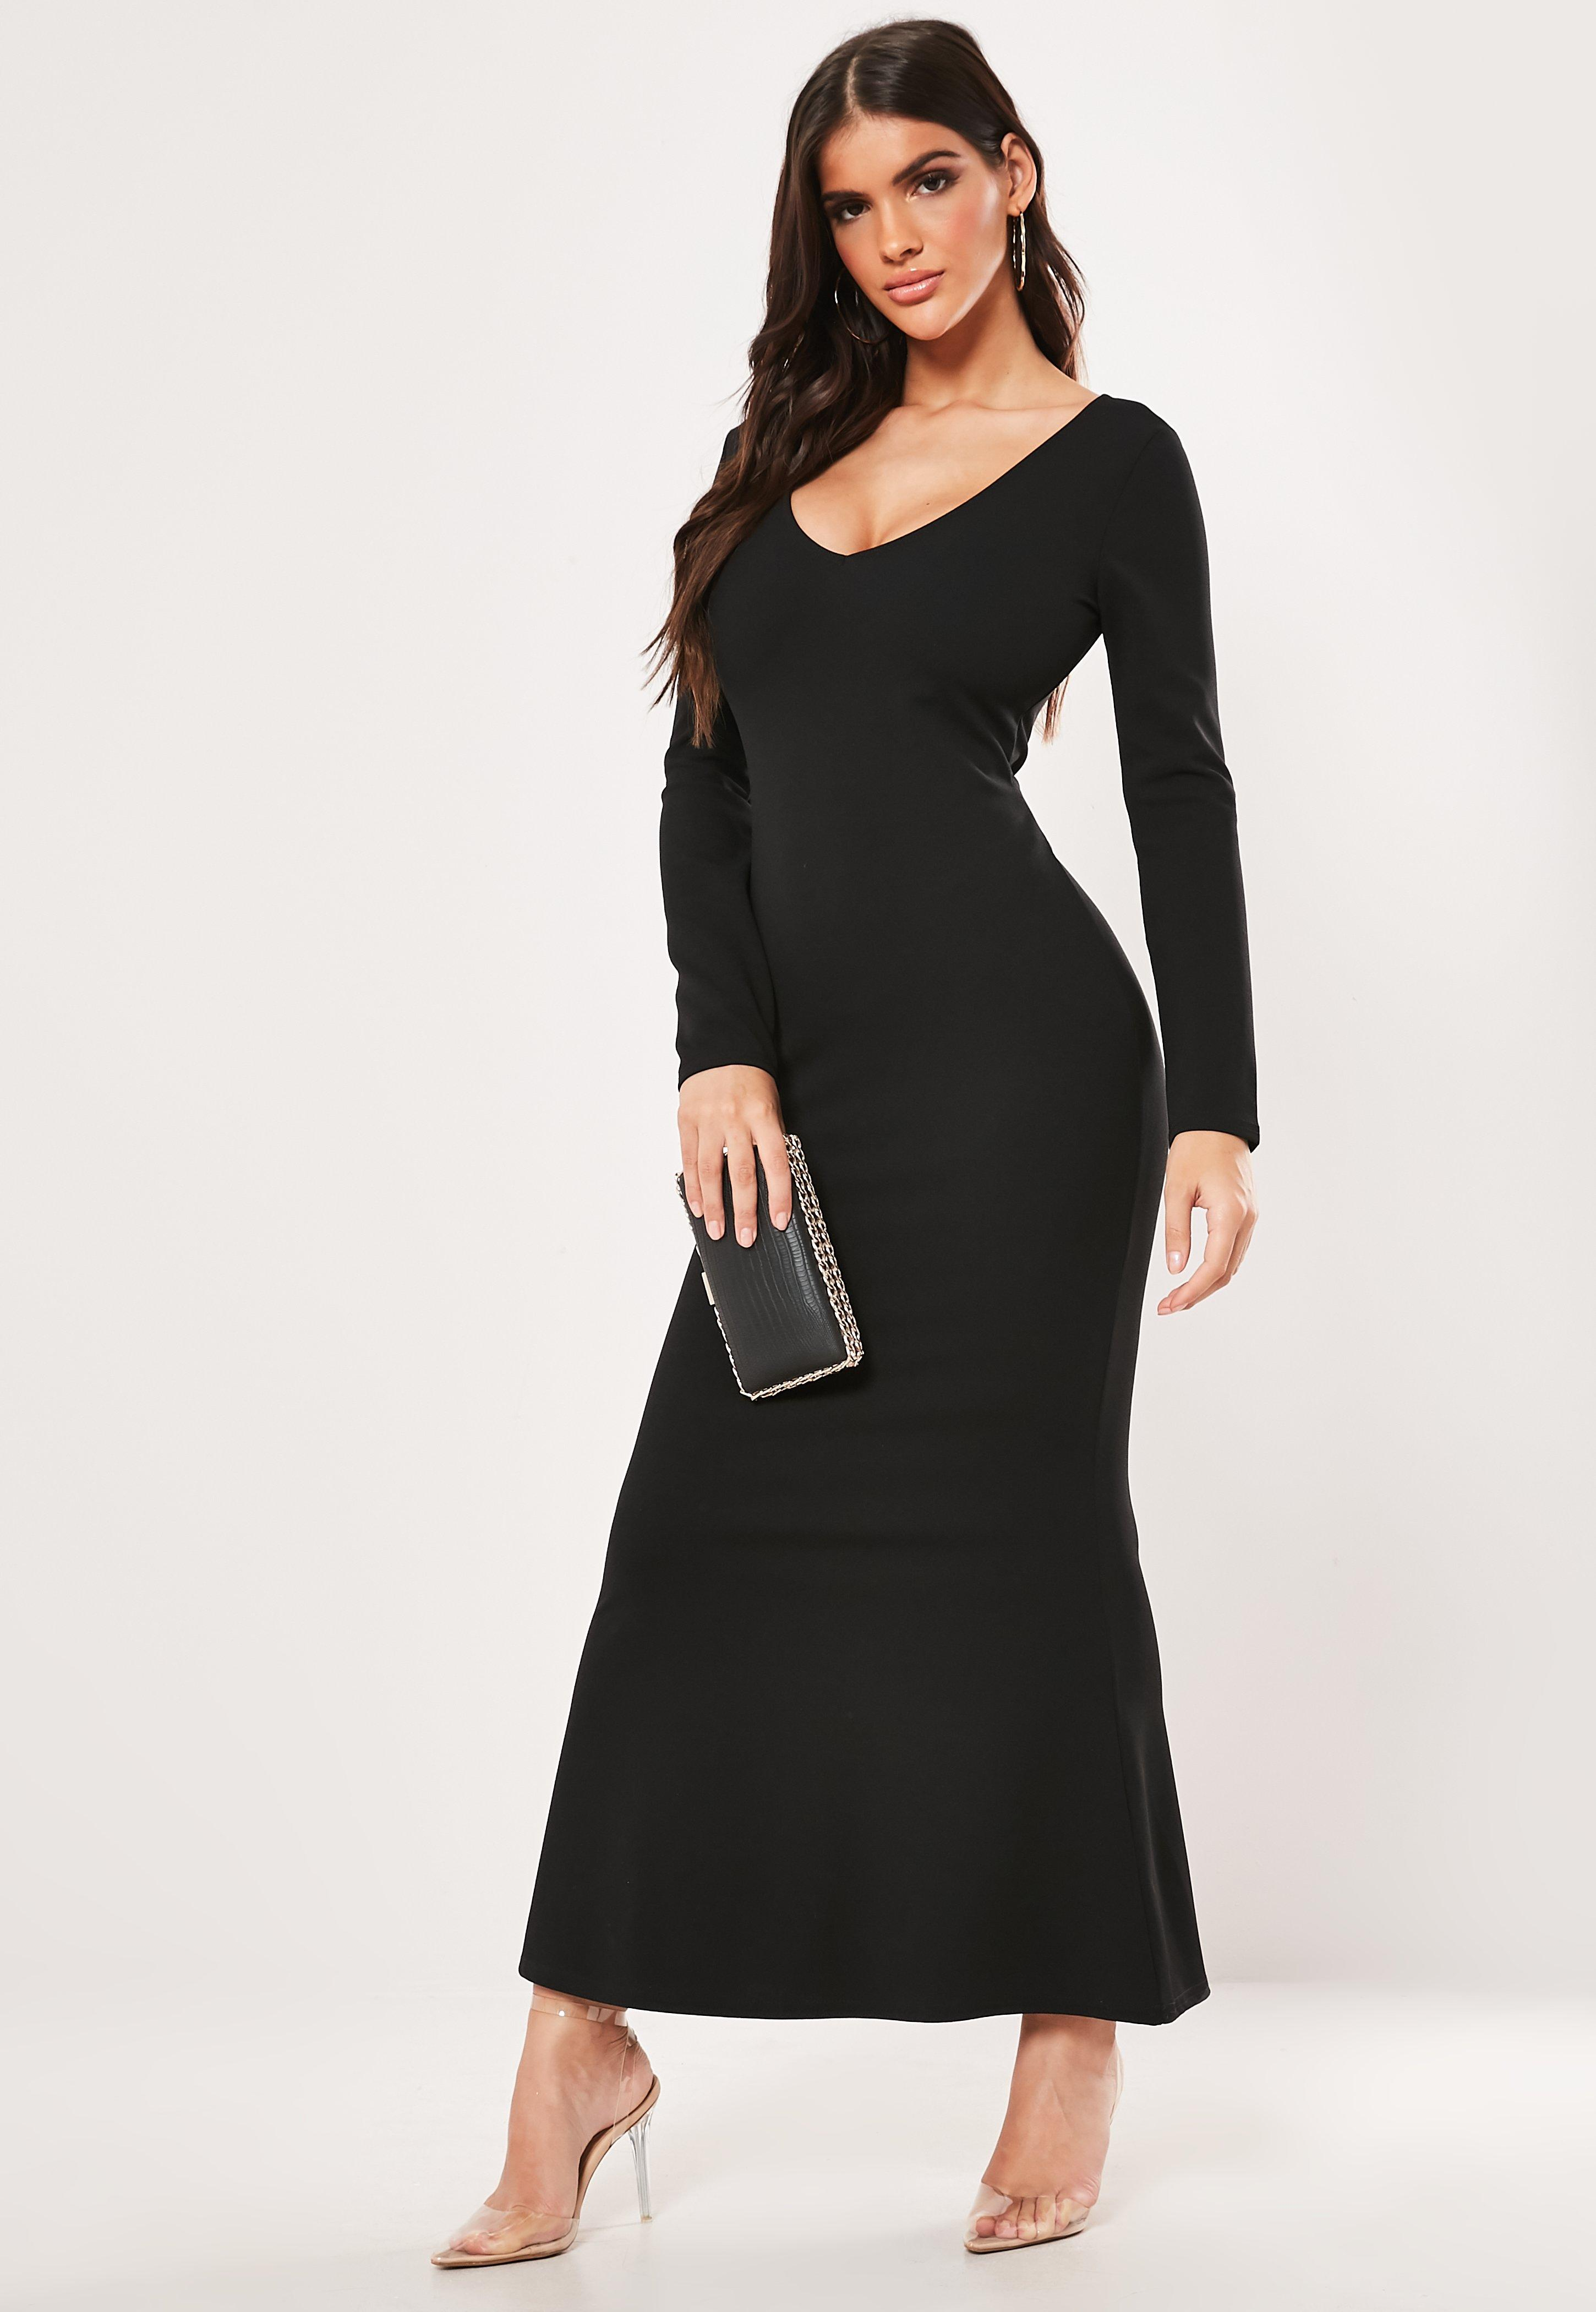 c47cb873d Petite Black Long Sleeve Cross Back Maxi Dress